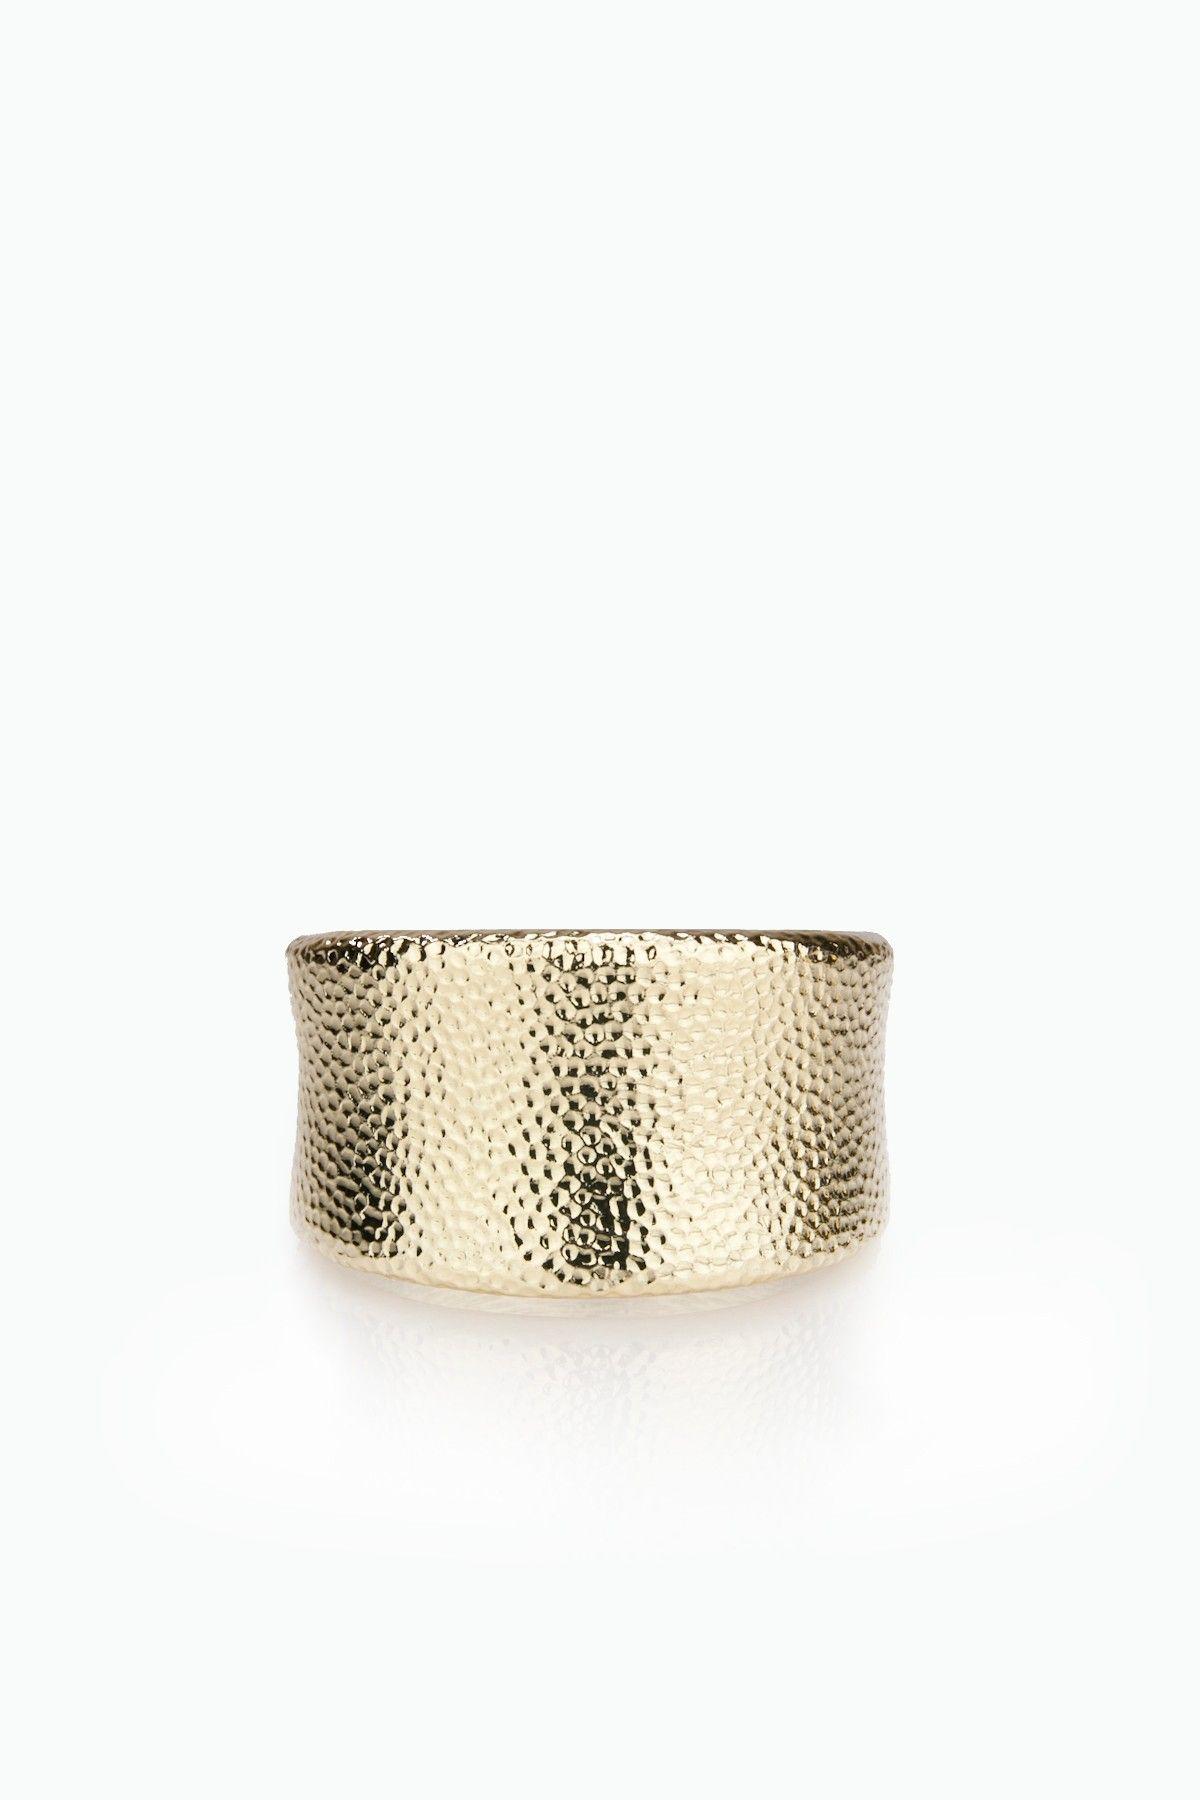 ShopSosie Style : Pebbled Cuff